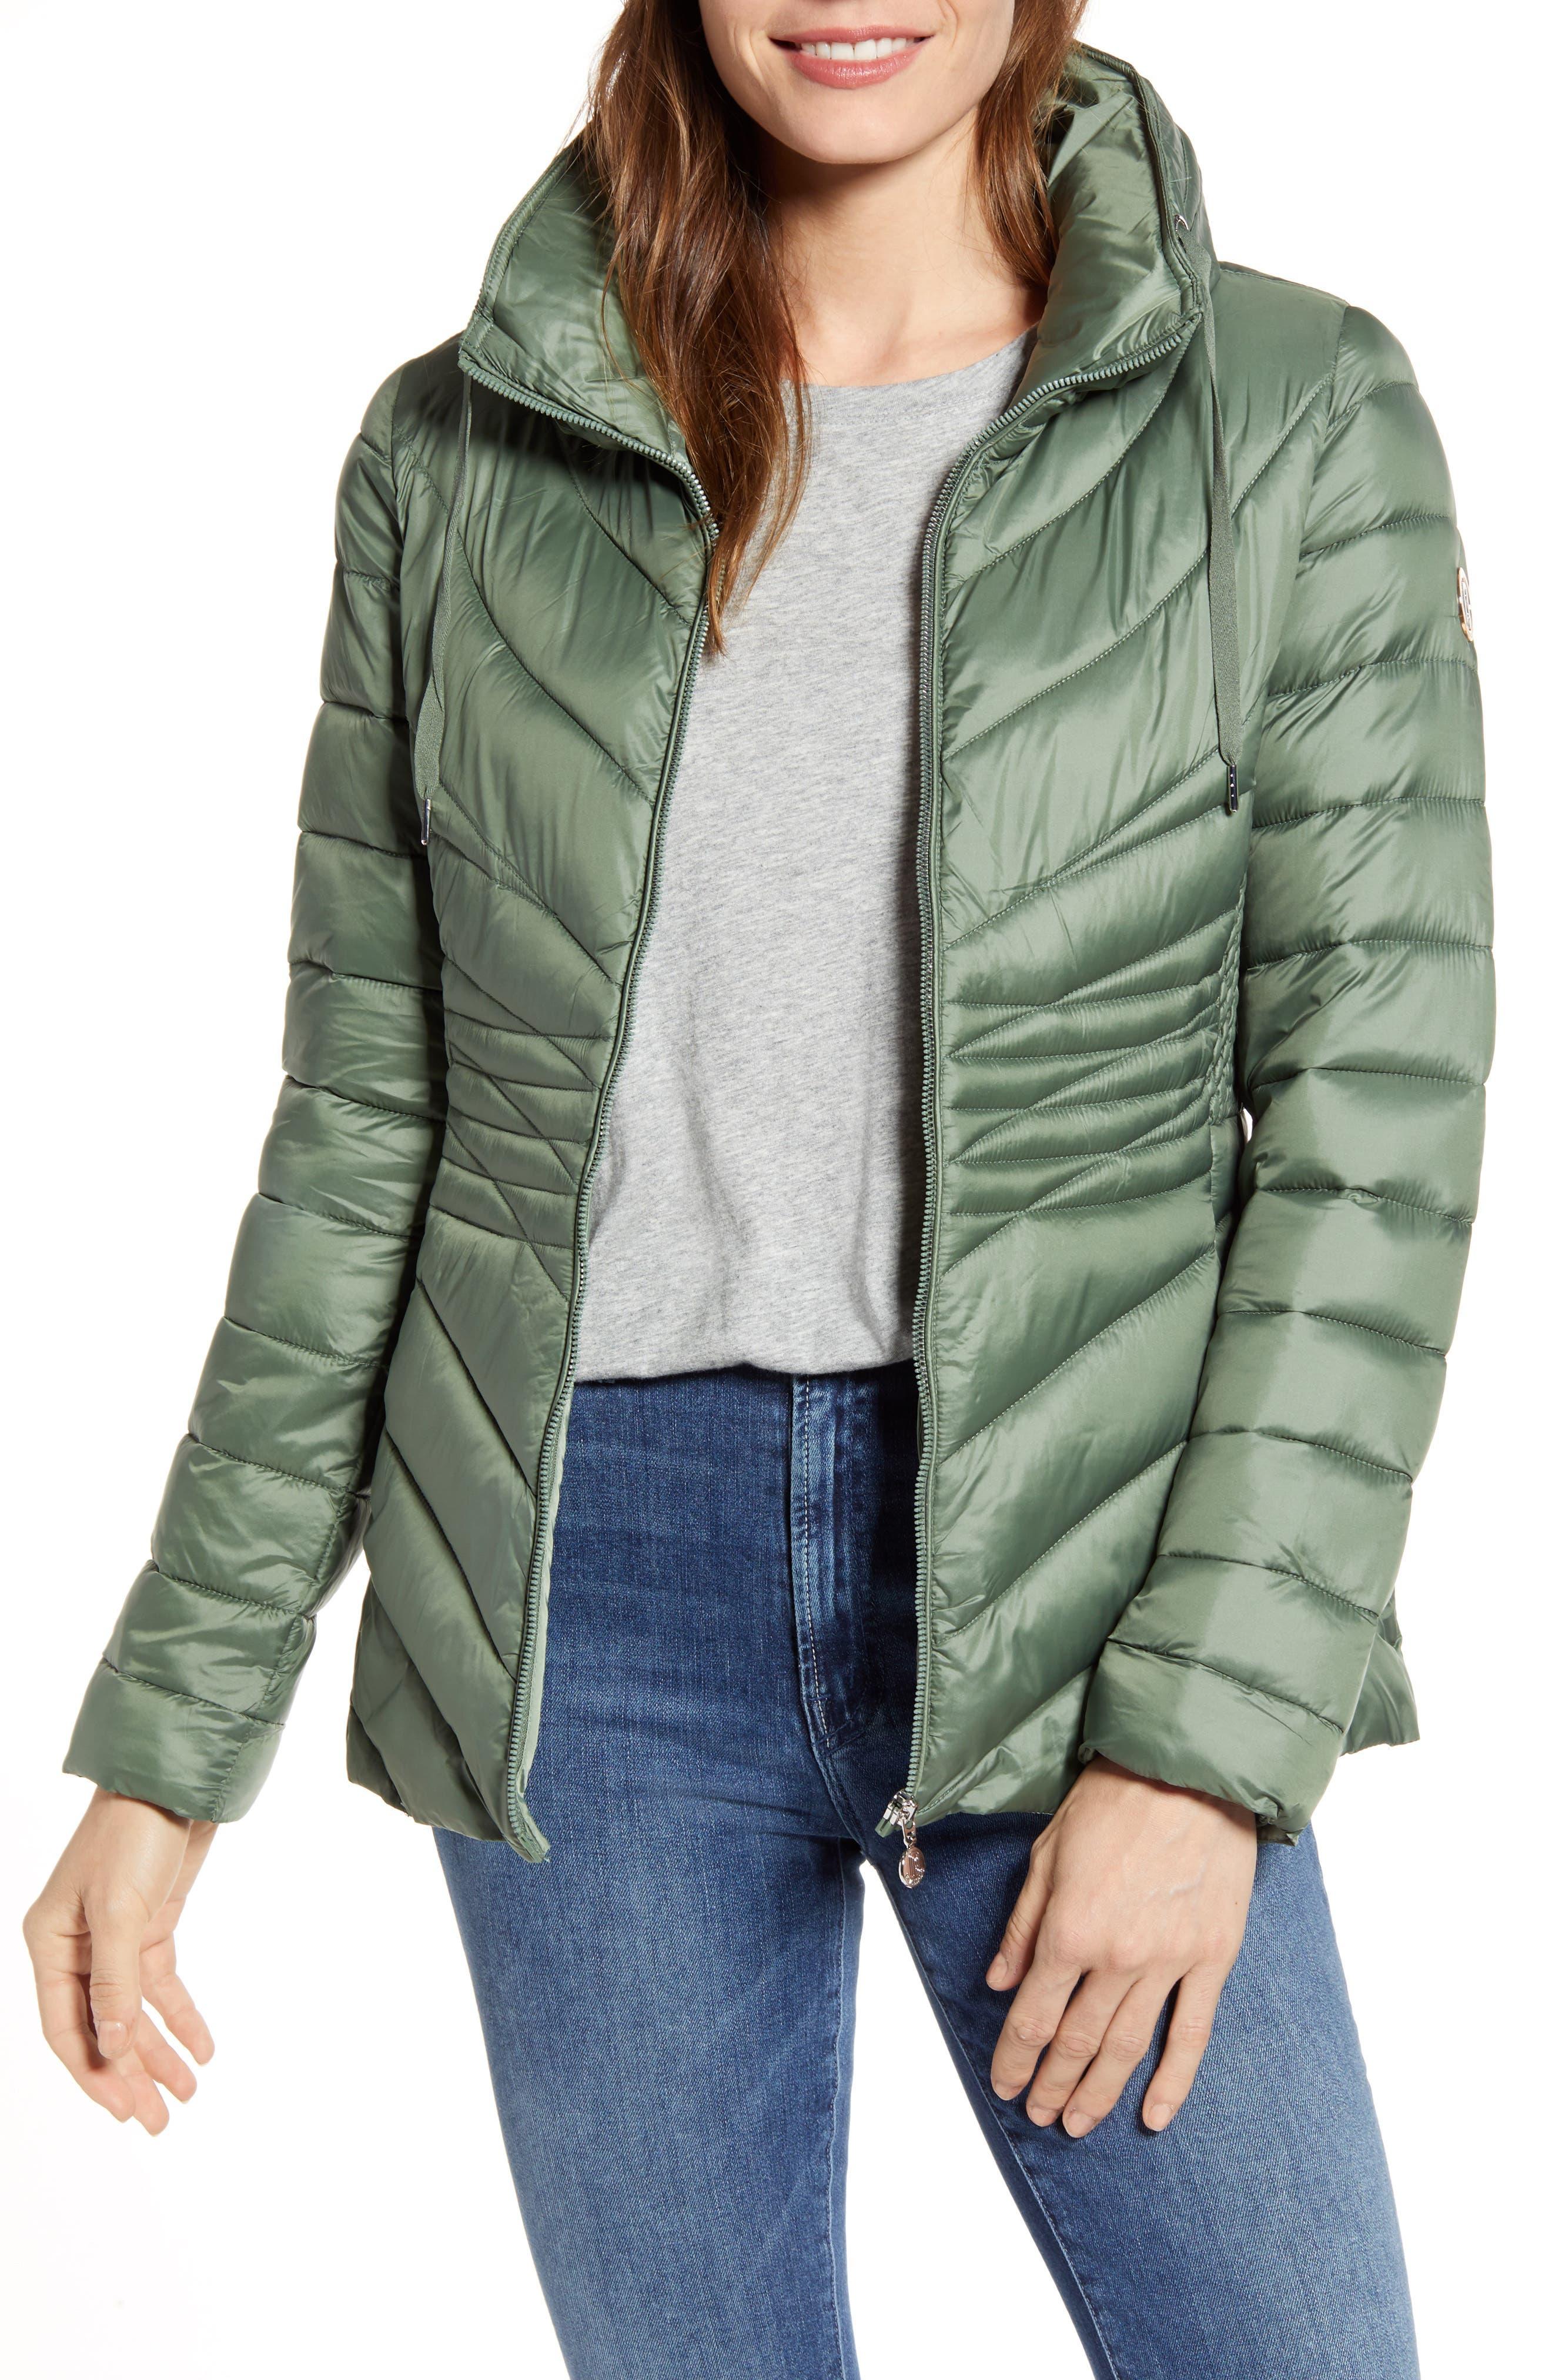 VERO MODA LADIES PADDED REVERSIBLE CAMOUFLAGE COAT BELOW 1//2 PRICE SIZE SMALL